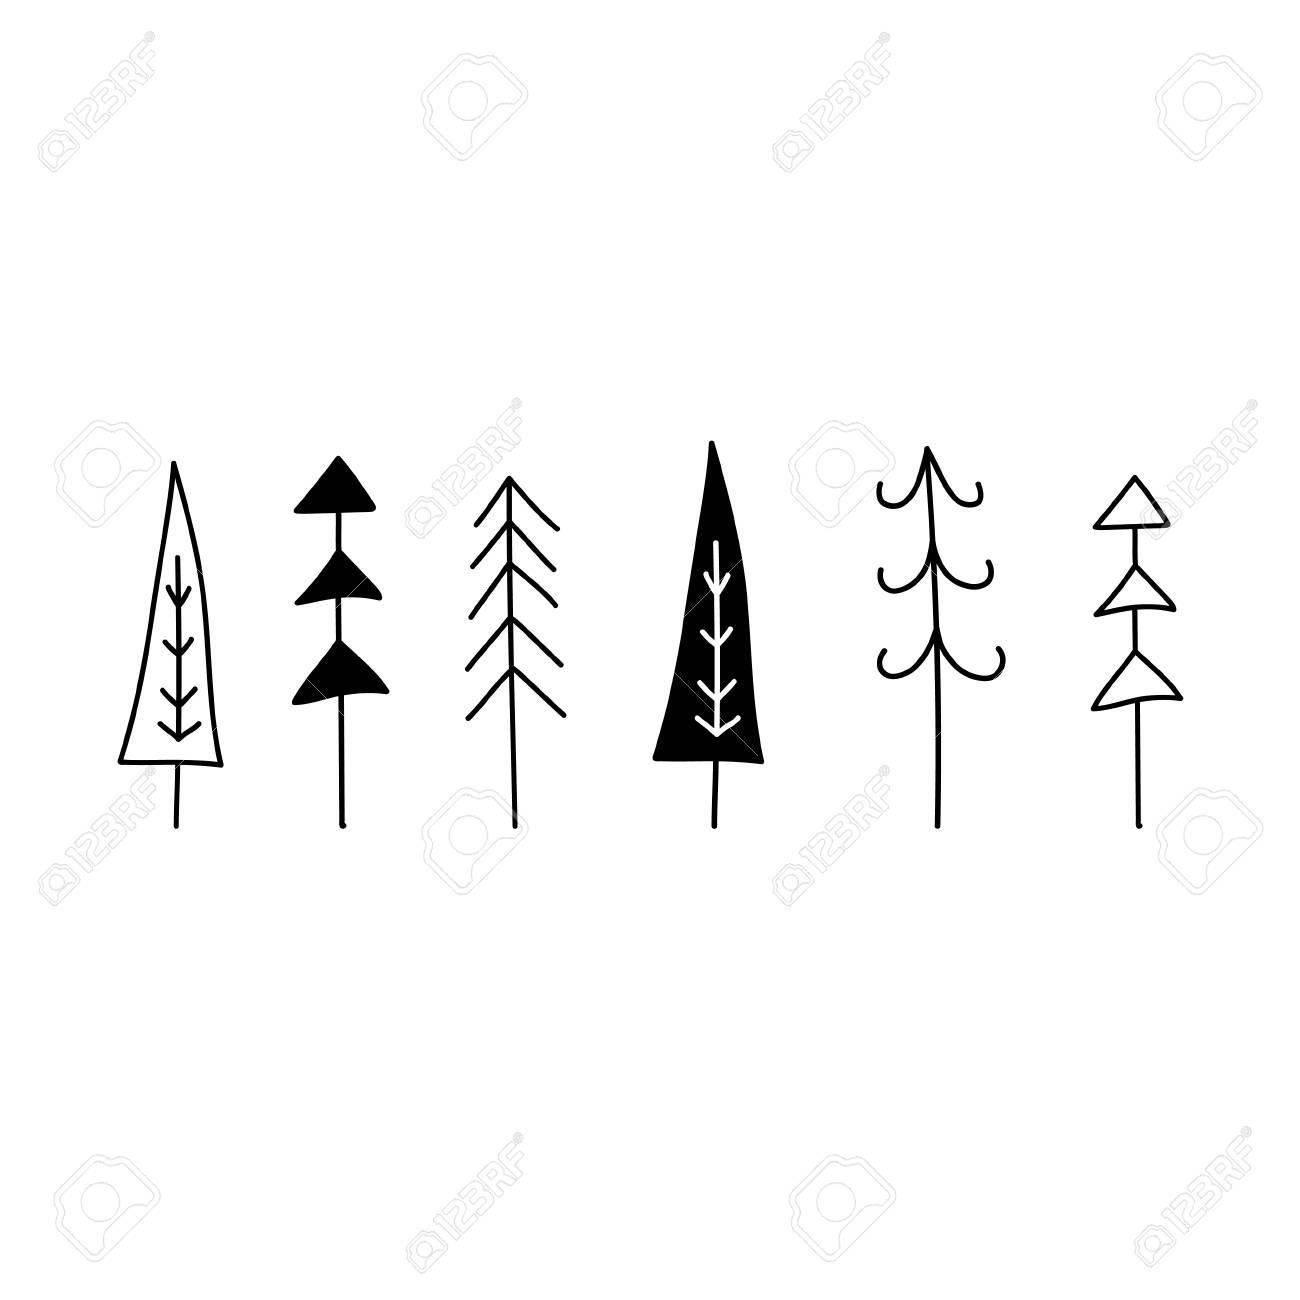 Christmas Tree Set Hand Drawn Graphic Vector Illustration Line Hand Drawn Christmas Cards Christmas Tree Graphic Christmas Card Design